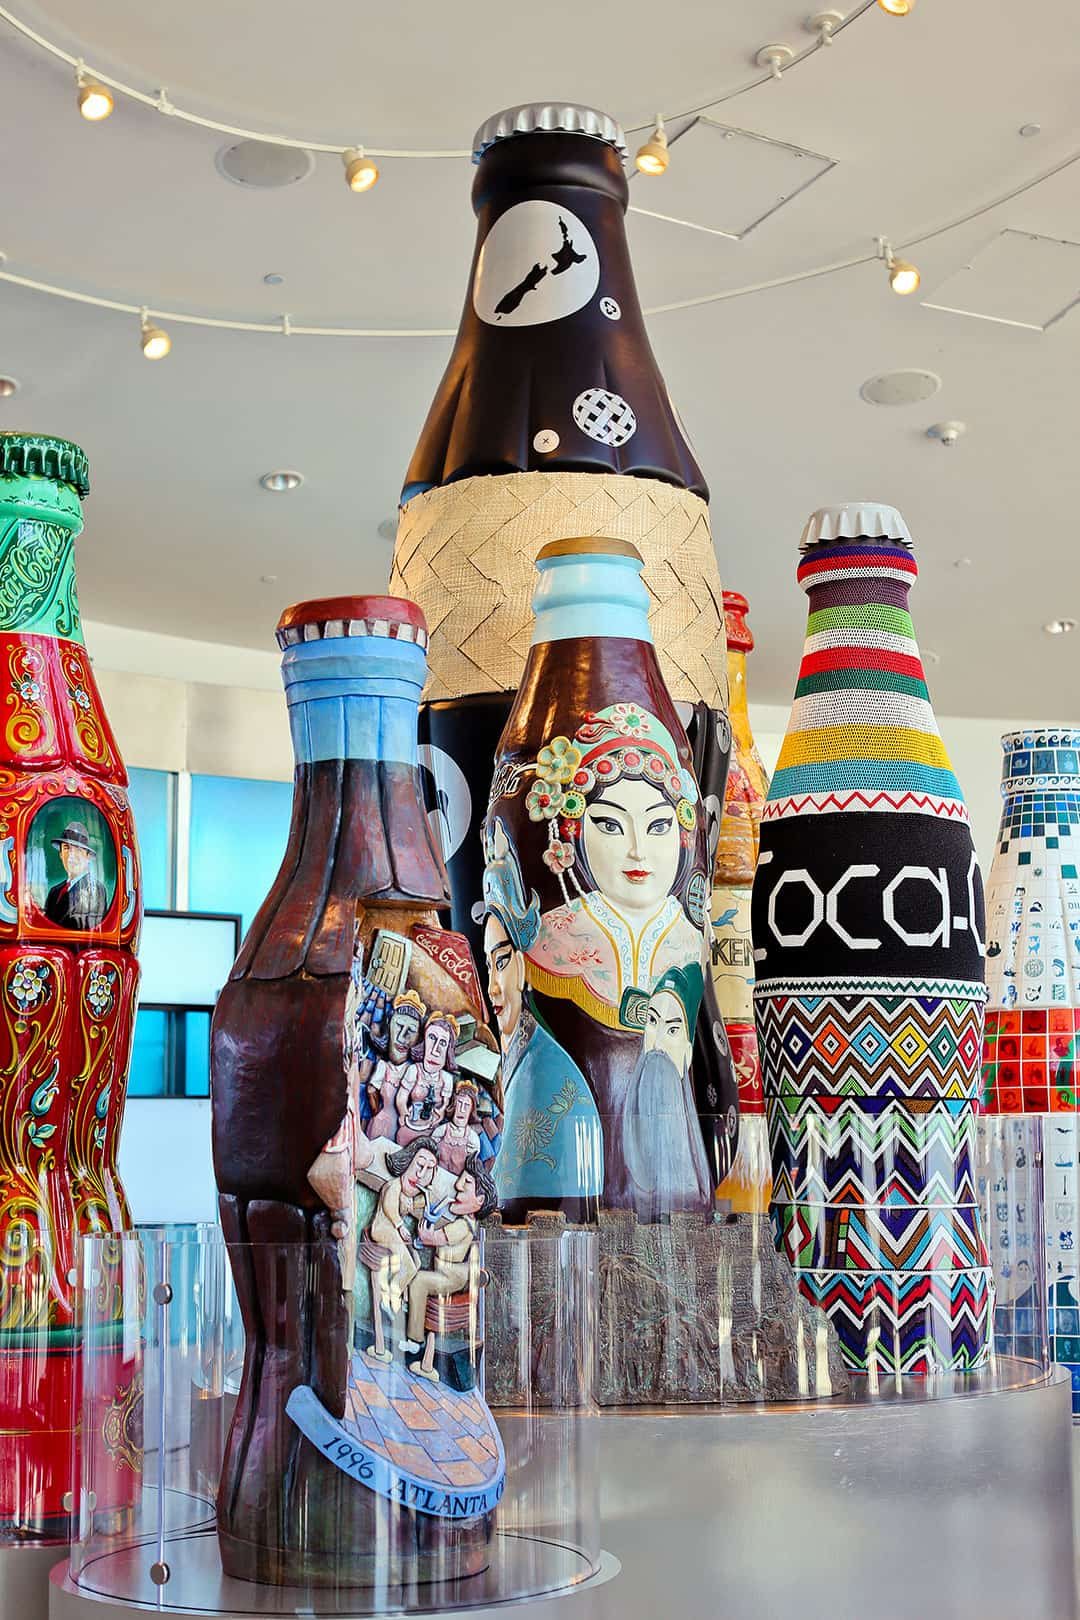 World of Coca Cola Museum